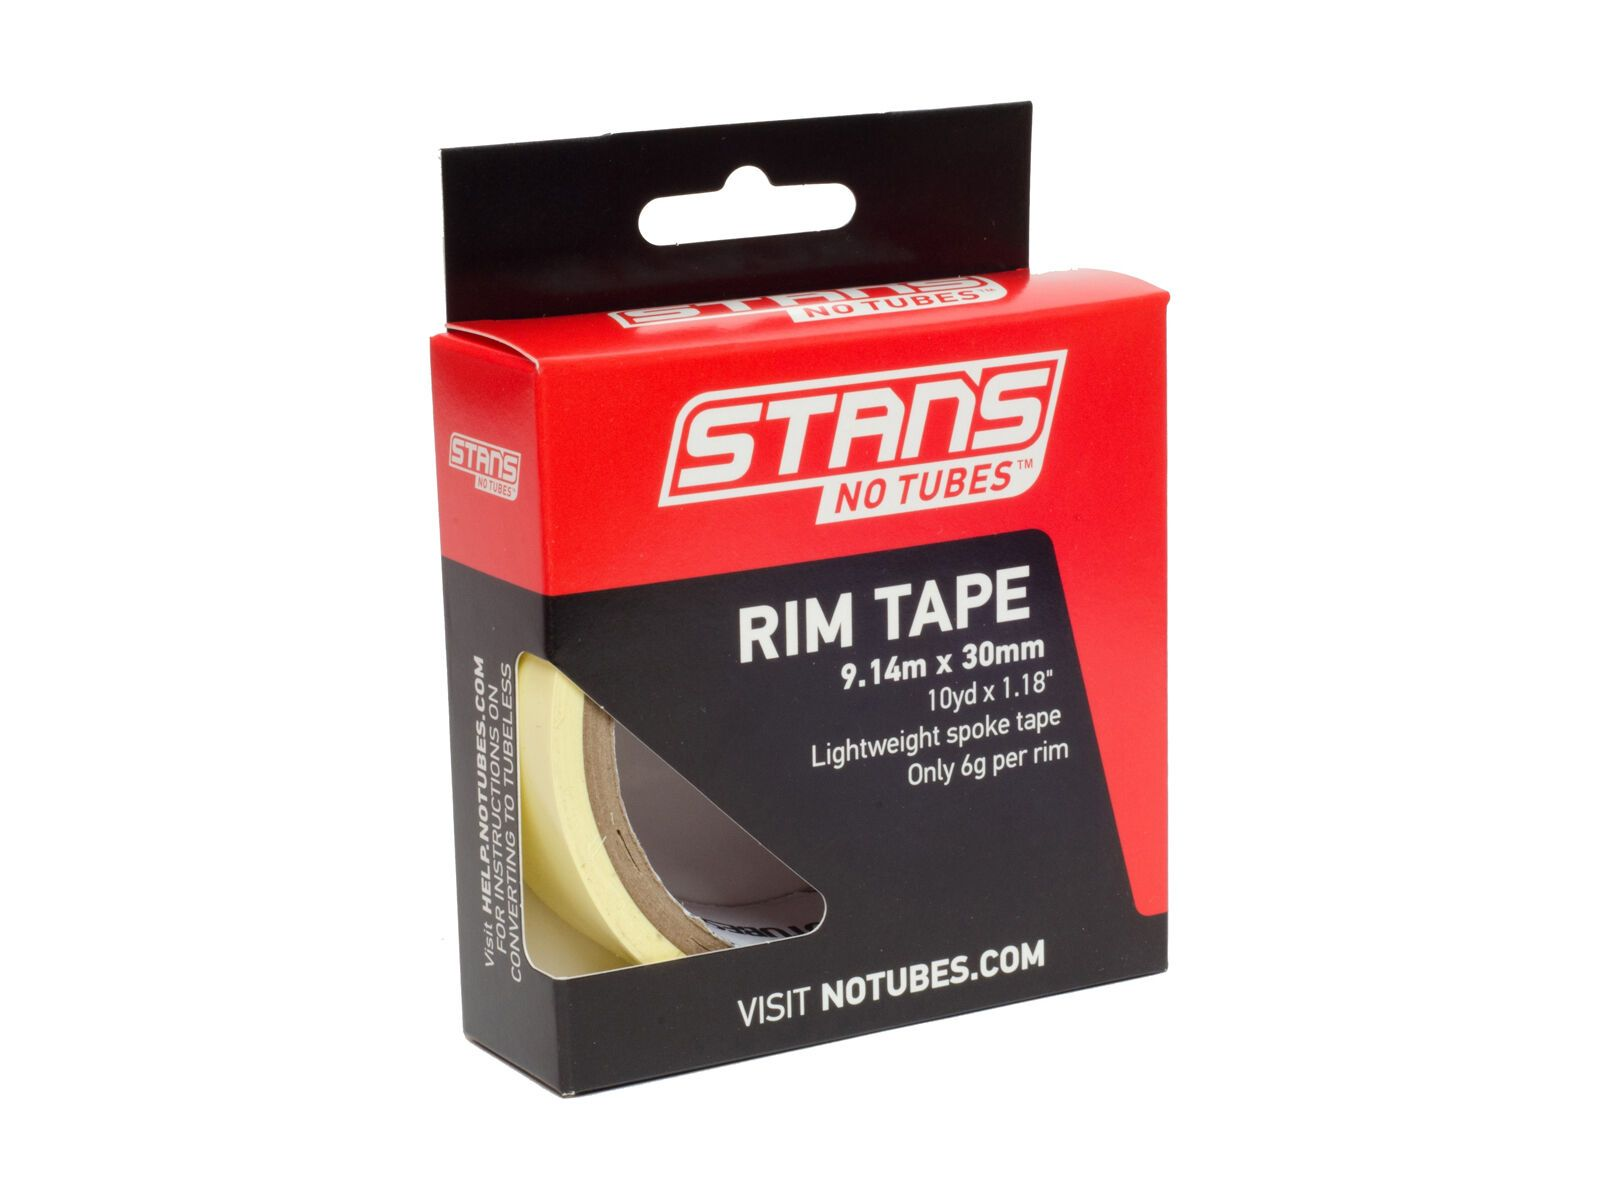 Stan's NoTubes Rim Tape 10yd x 30 mm - Felgenband 337000061